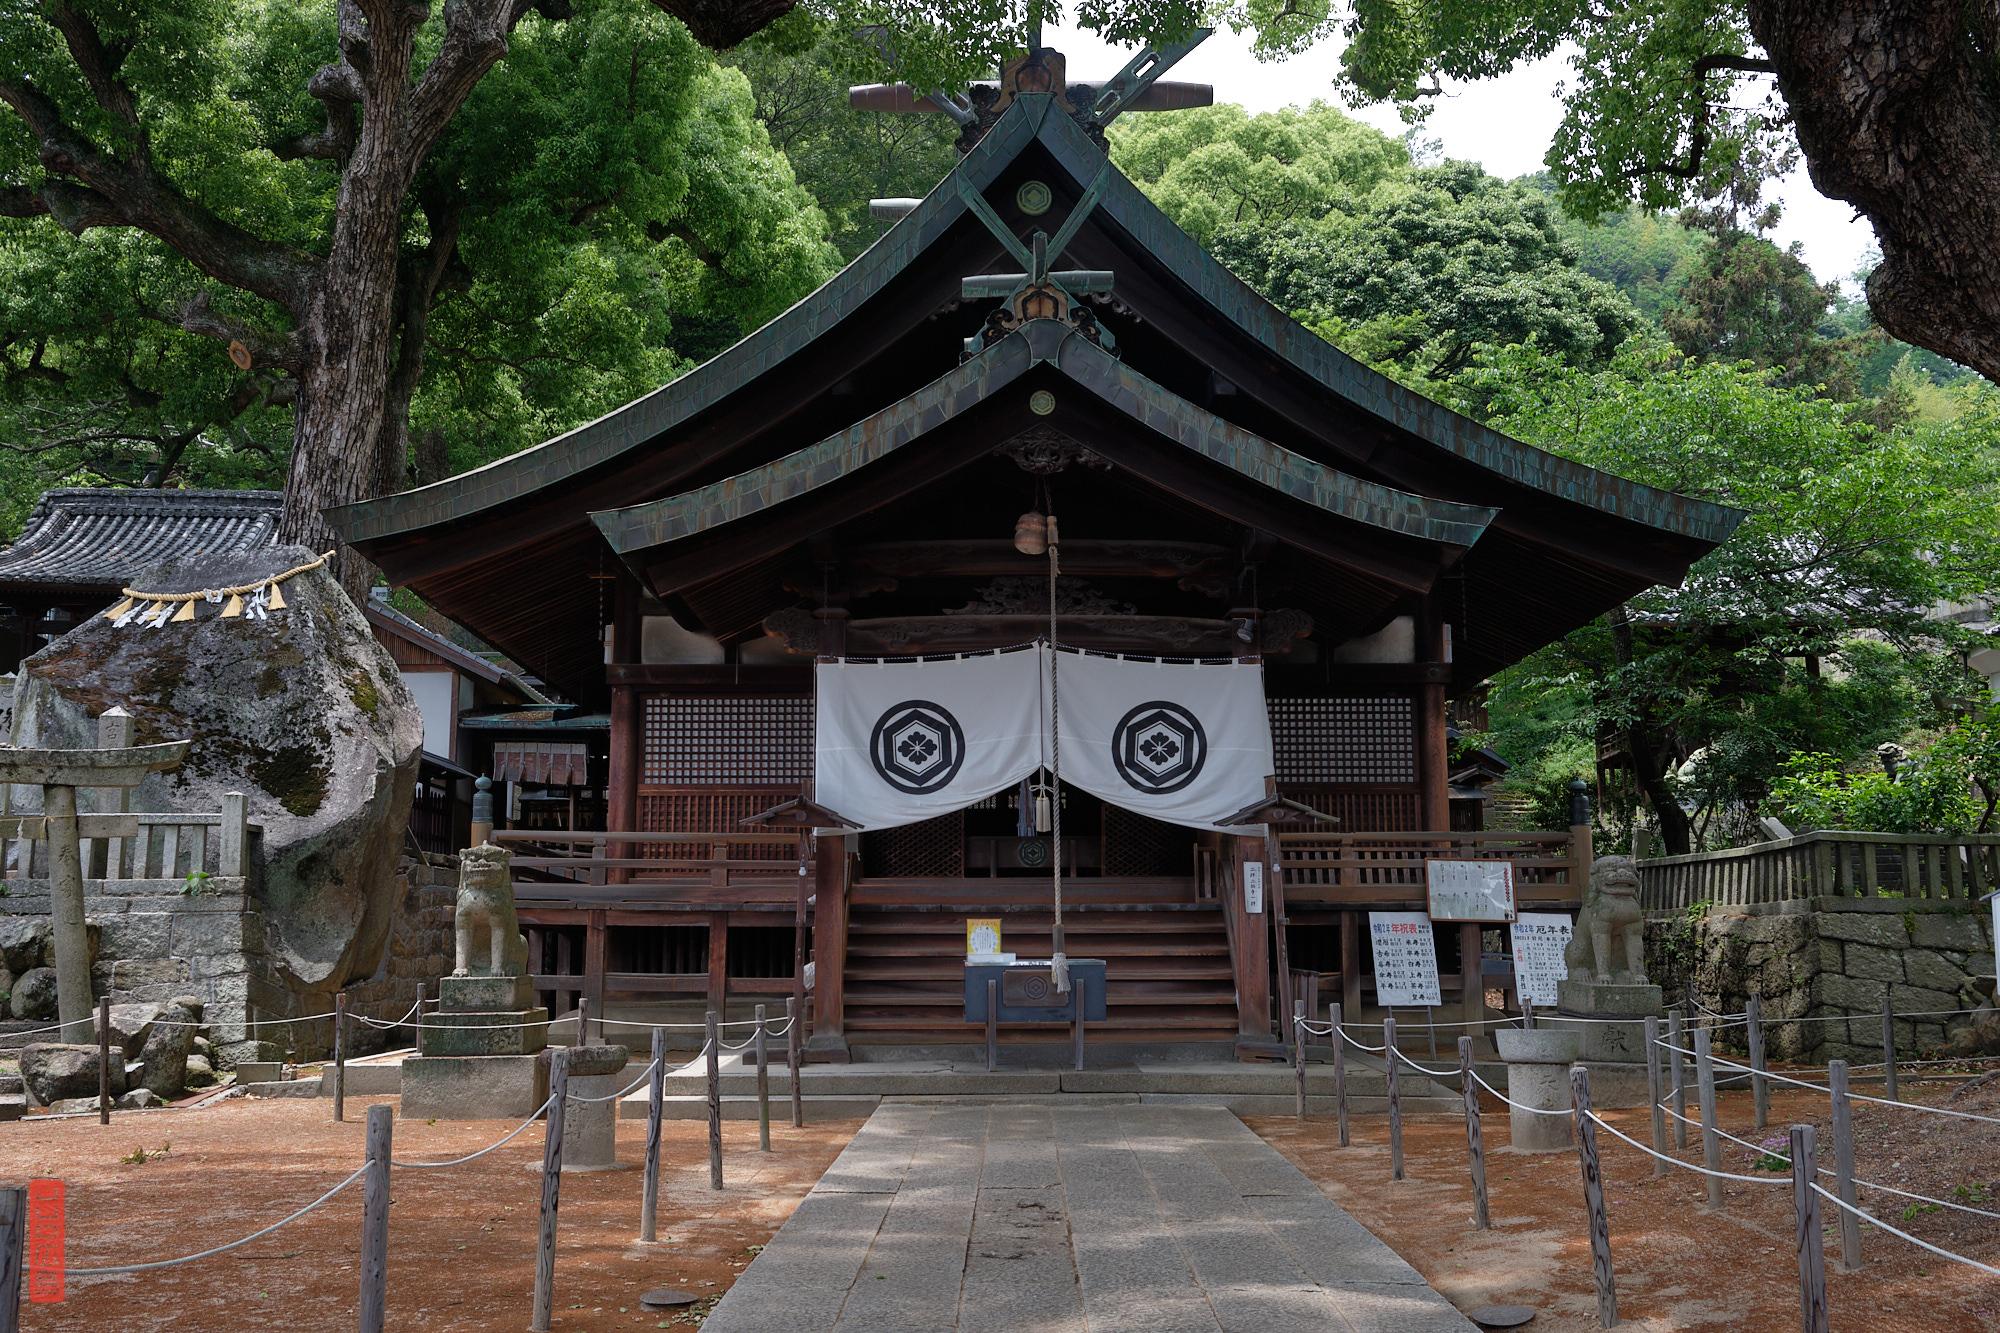 Santuraire Ushitora / Onomichi